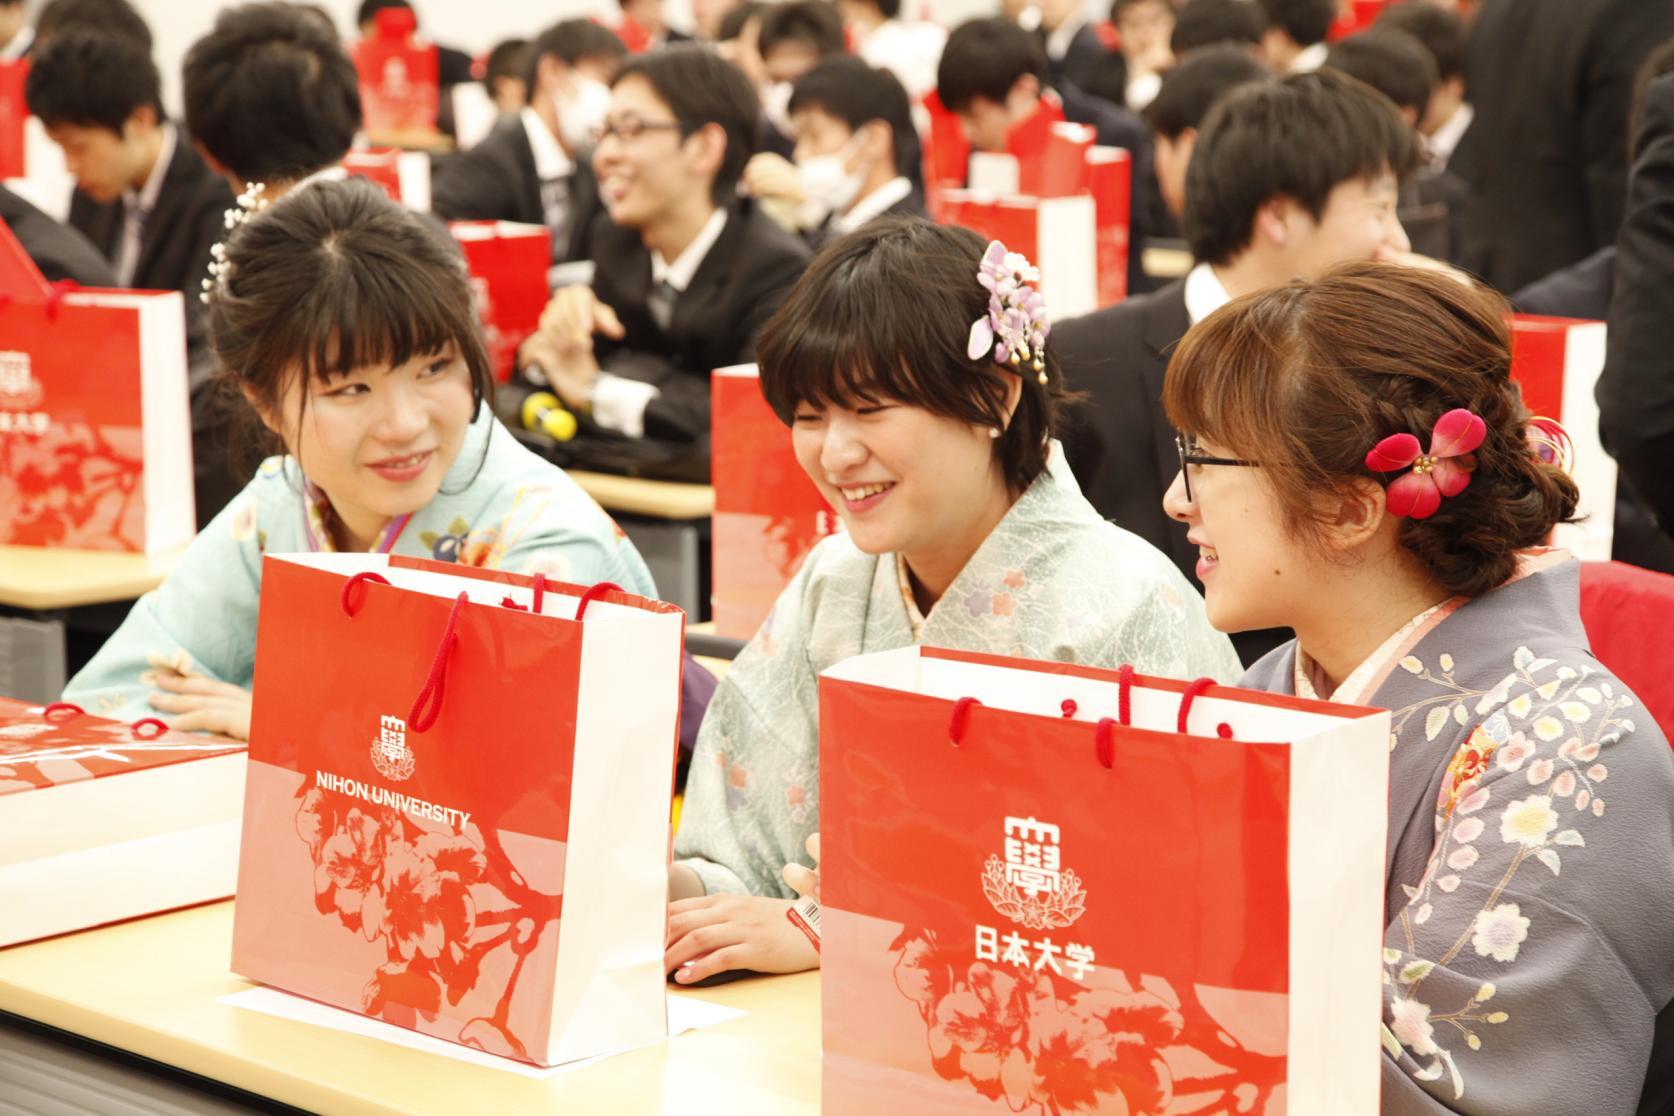 平成30年度日本大学理工学部 日本大学大学院理工学研究科 博士前・後期課程 短期大学部 学位記伝達式が執り行われました。